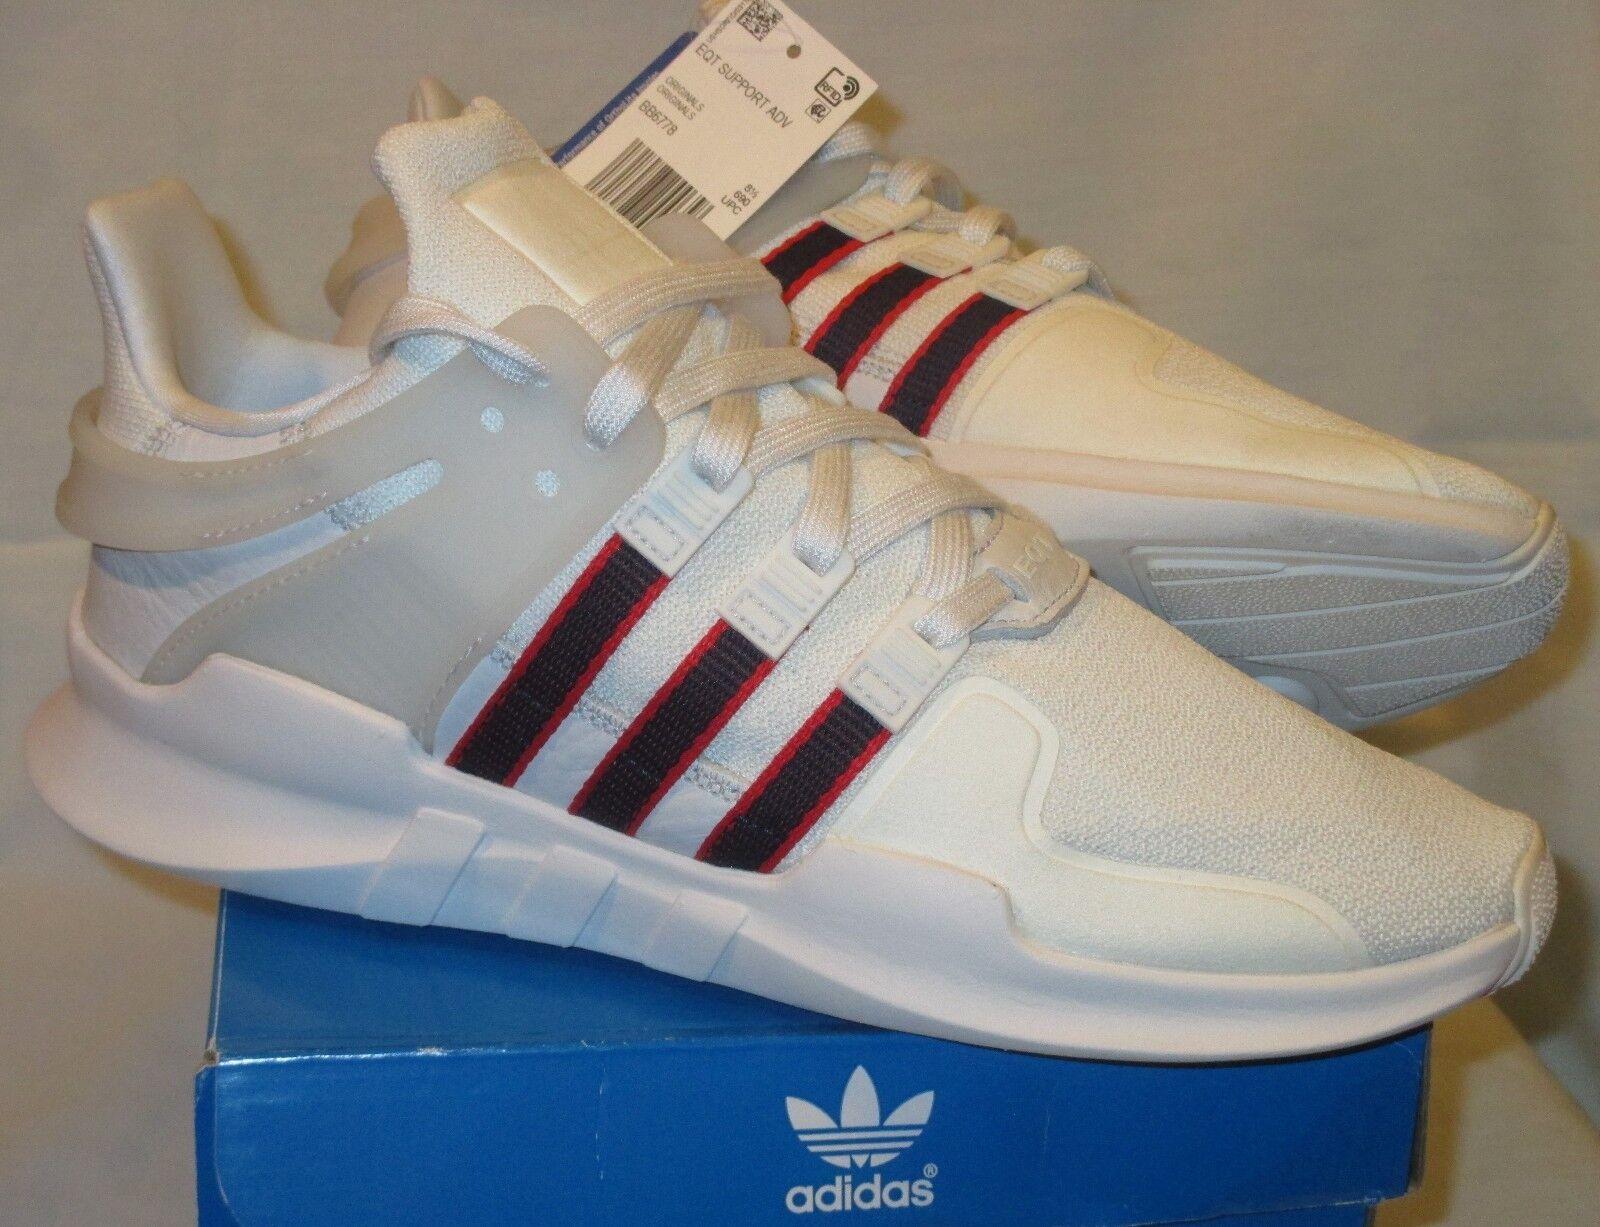 NIB hombre 's 9 Adidas Originals EQT Support ADV zapatos bb6778 blanco Navy